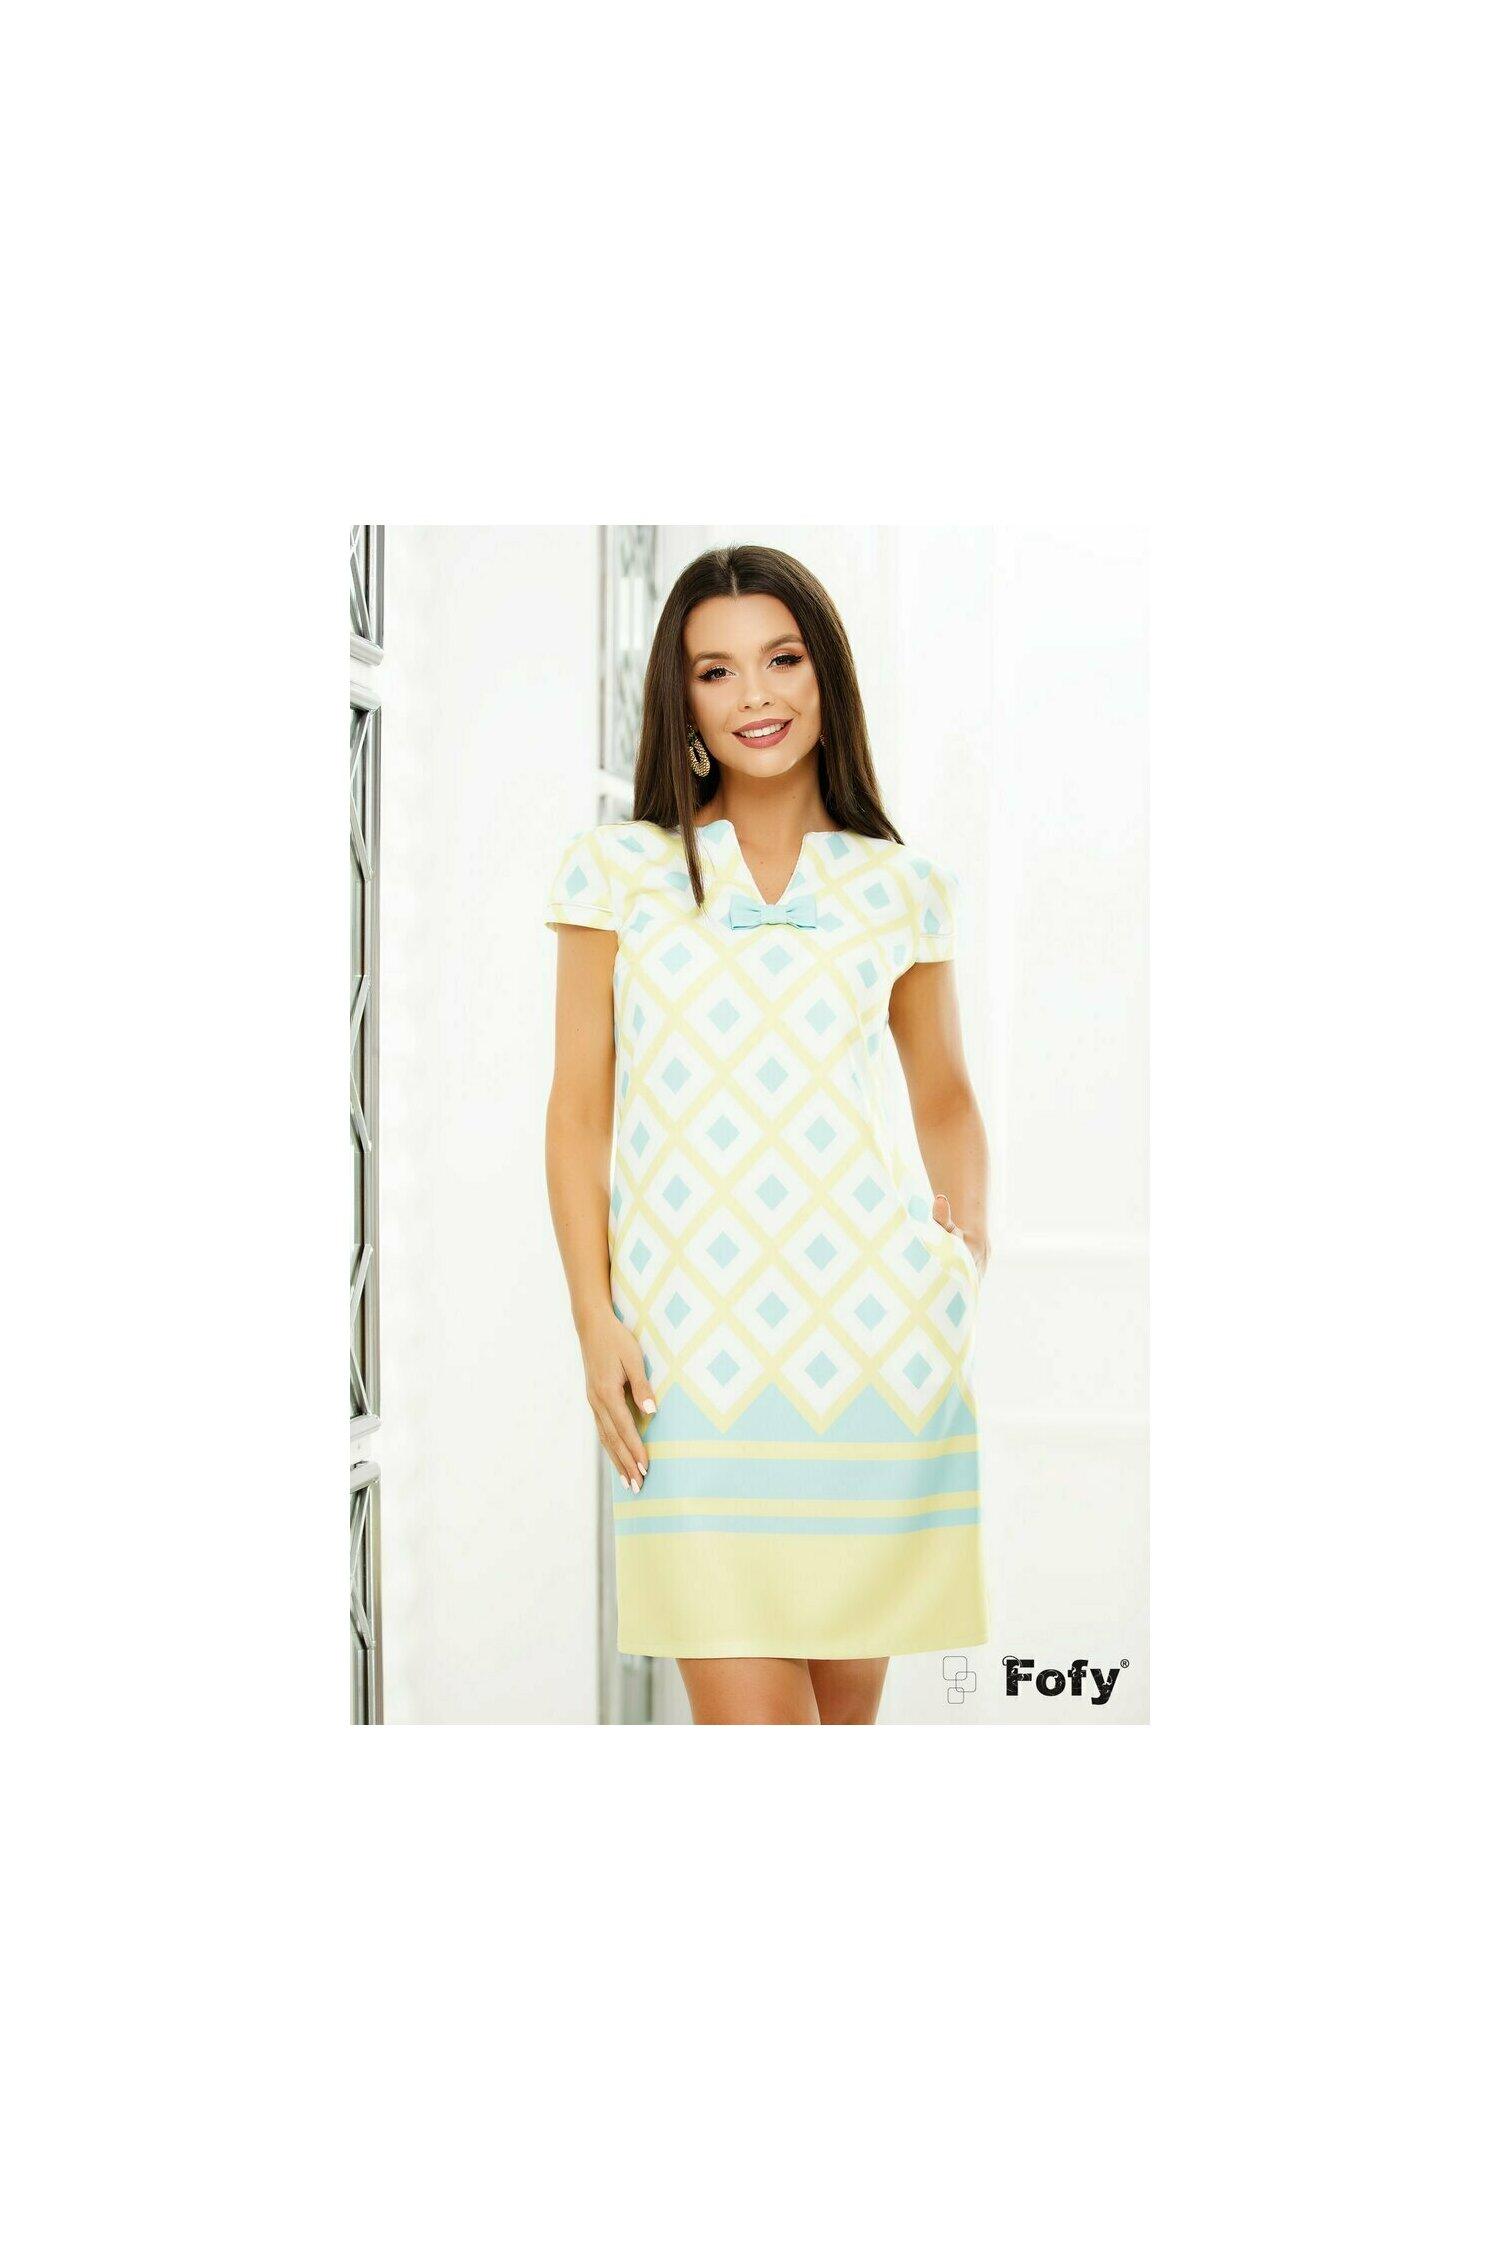 Rochie Fofy cu imprimeu geometric turquoise si galben pastel